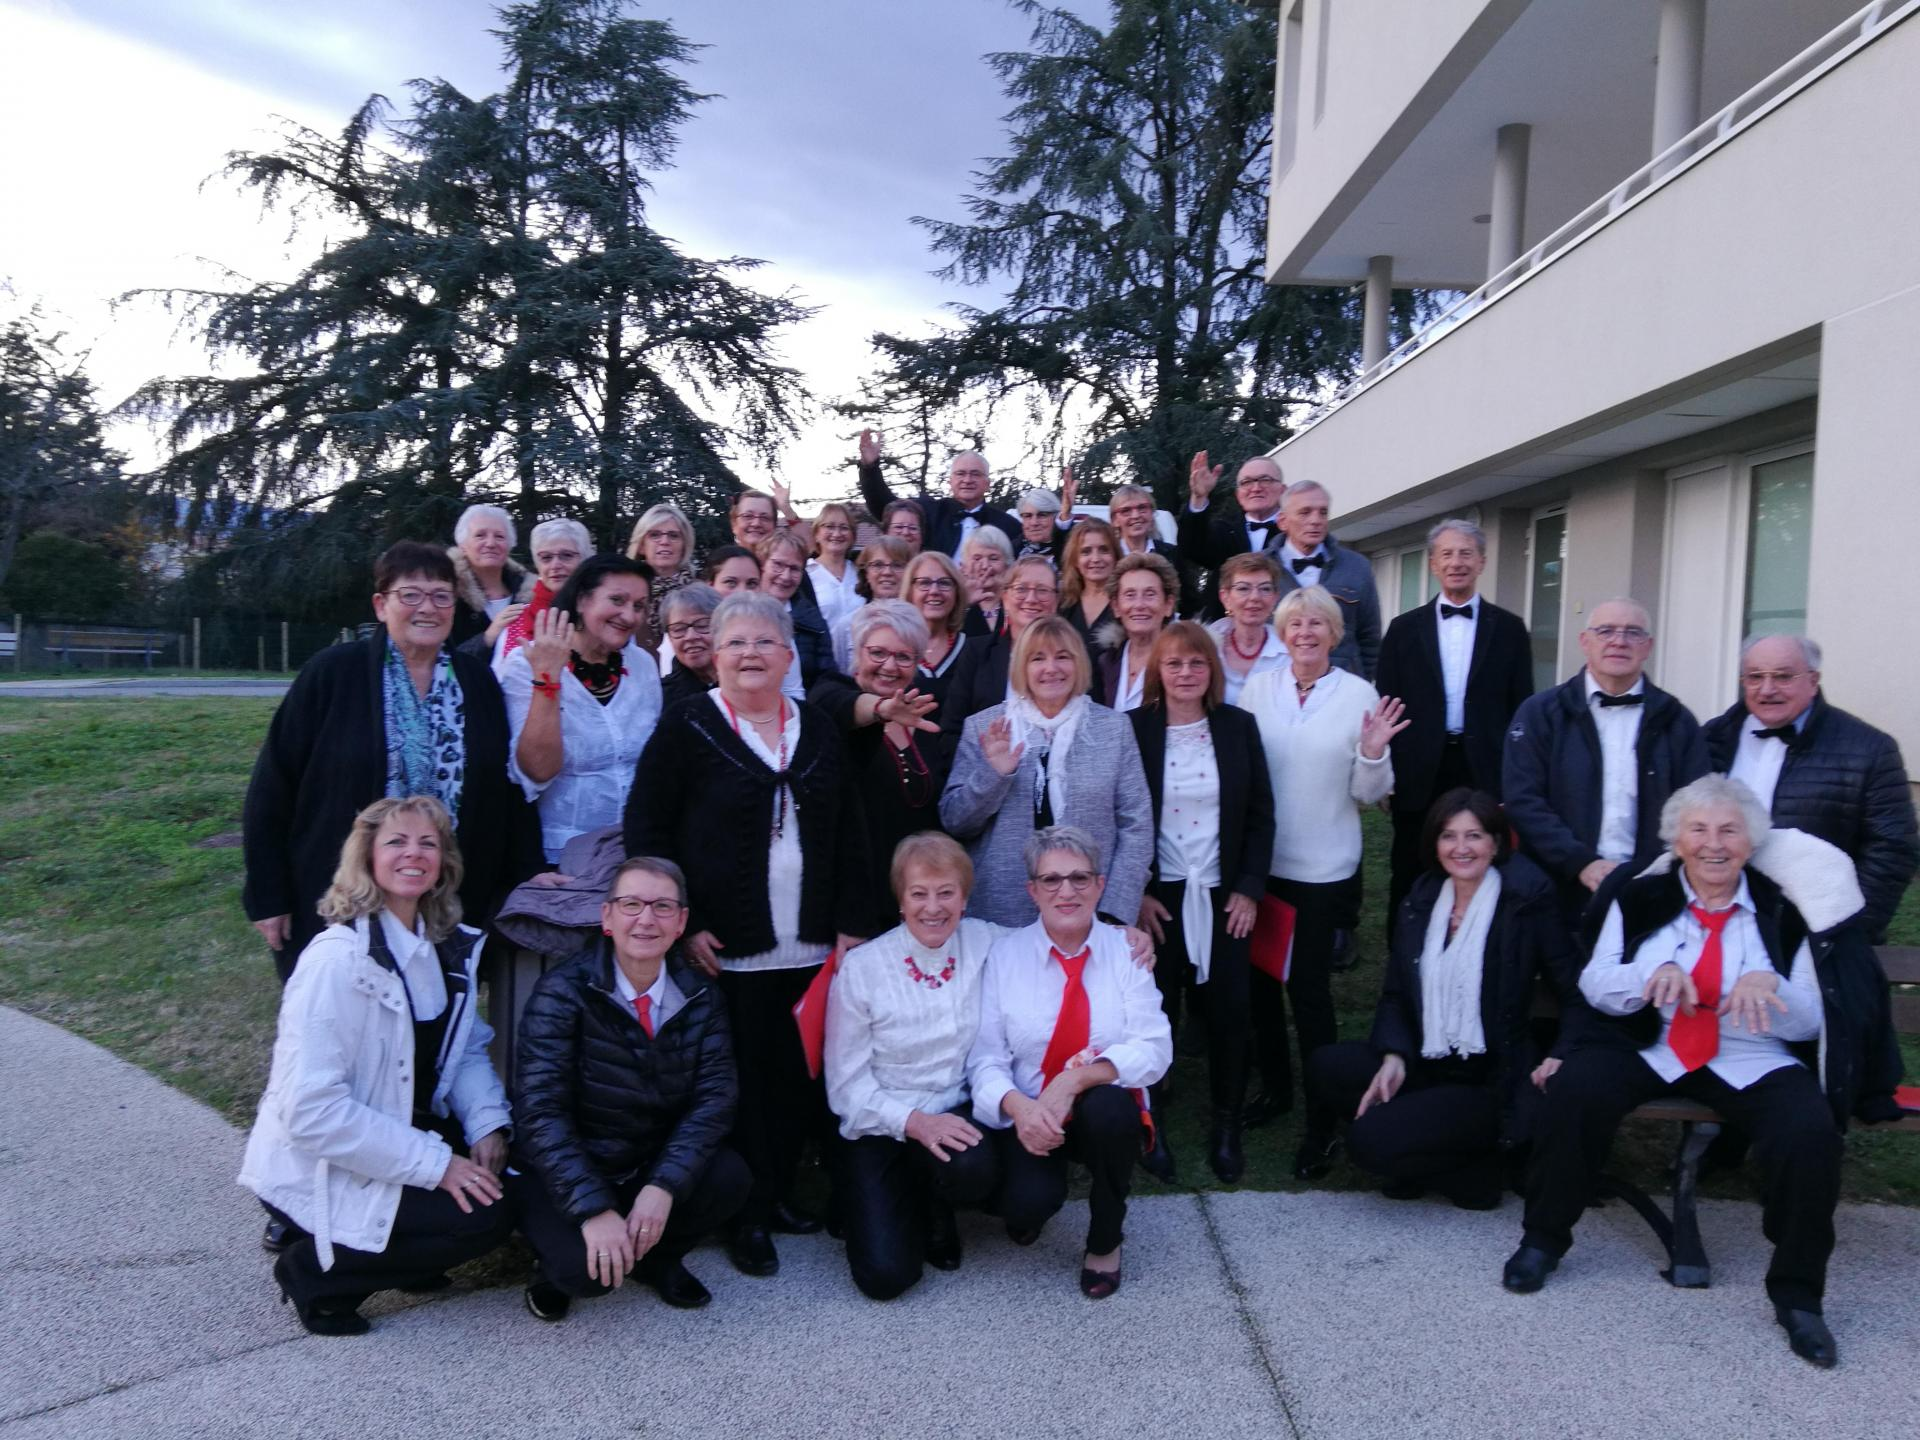 Chorale De Coeurs en Choeur  28 nov 2019